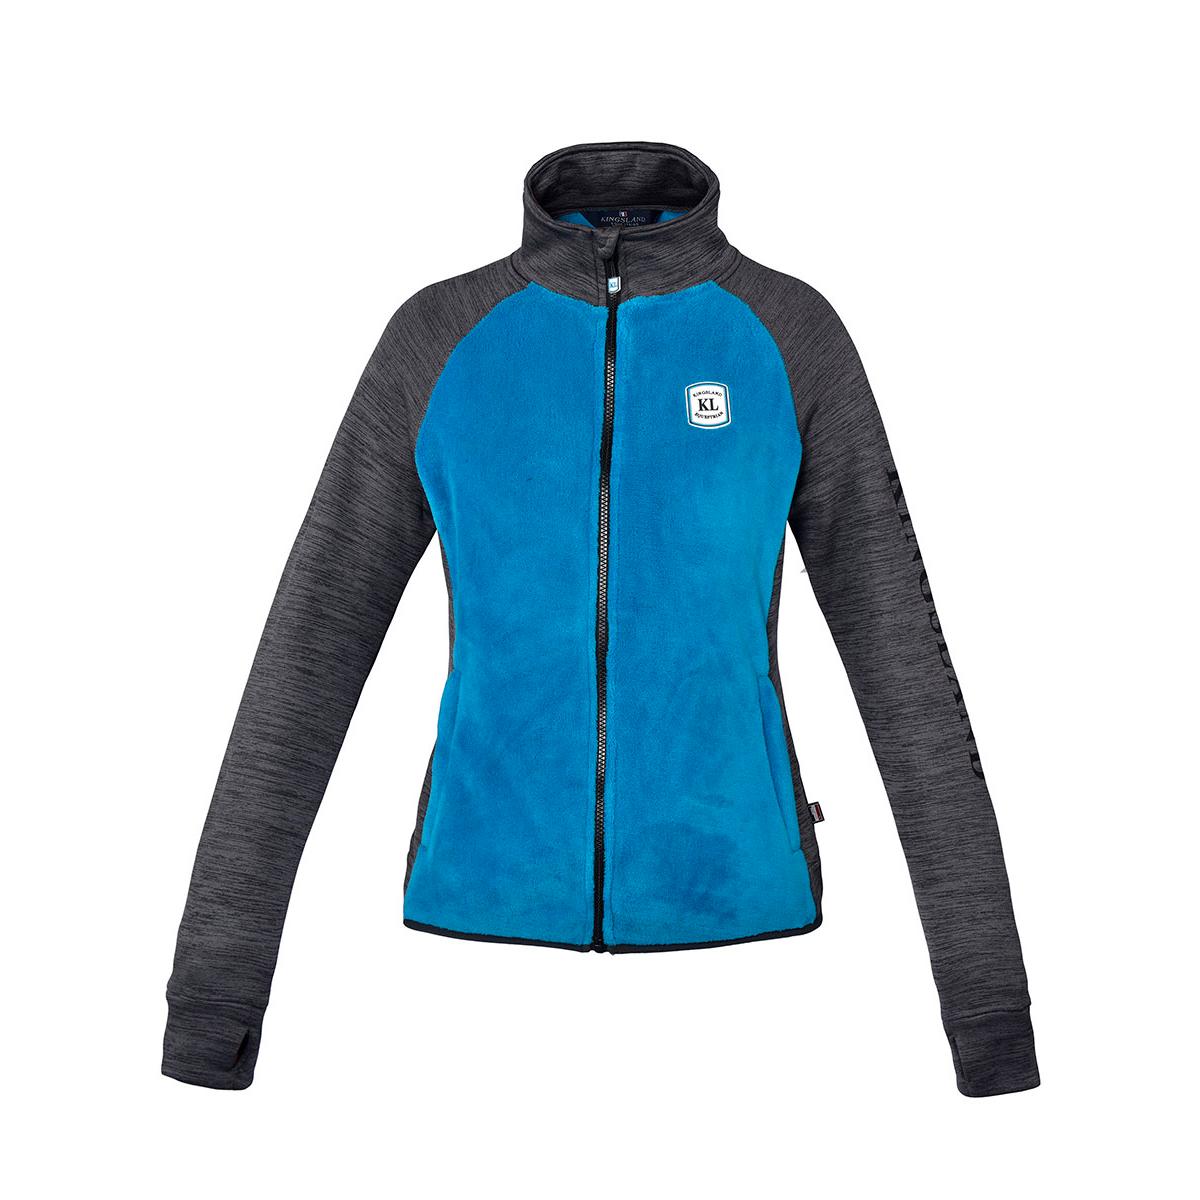 Kingsland Koschuta Ladies Fleece Jacket